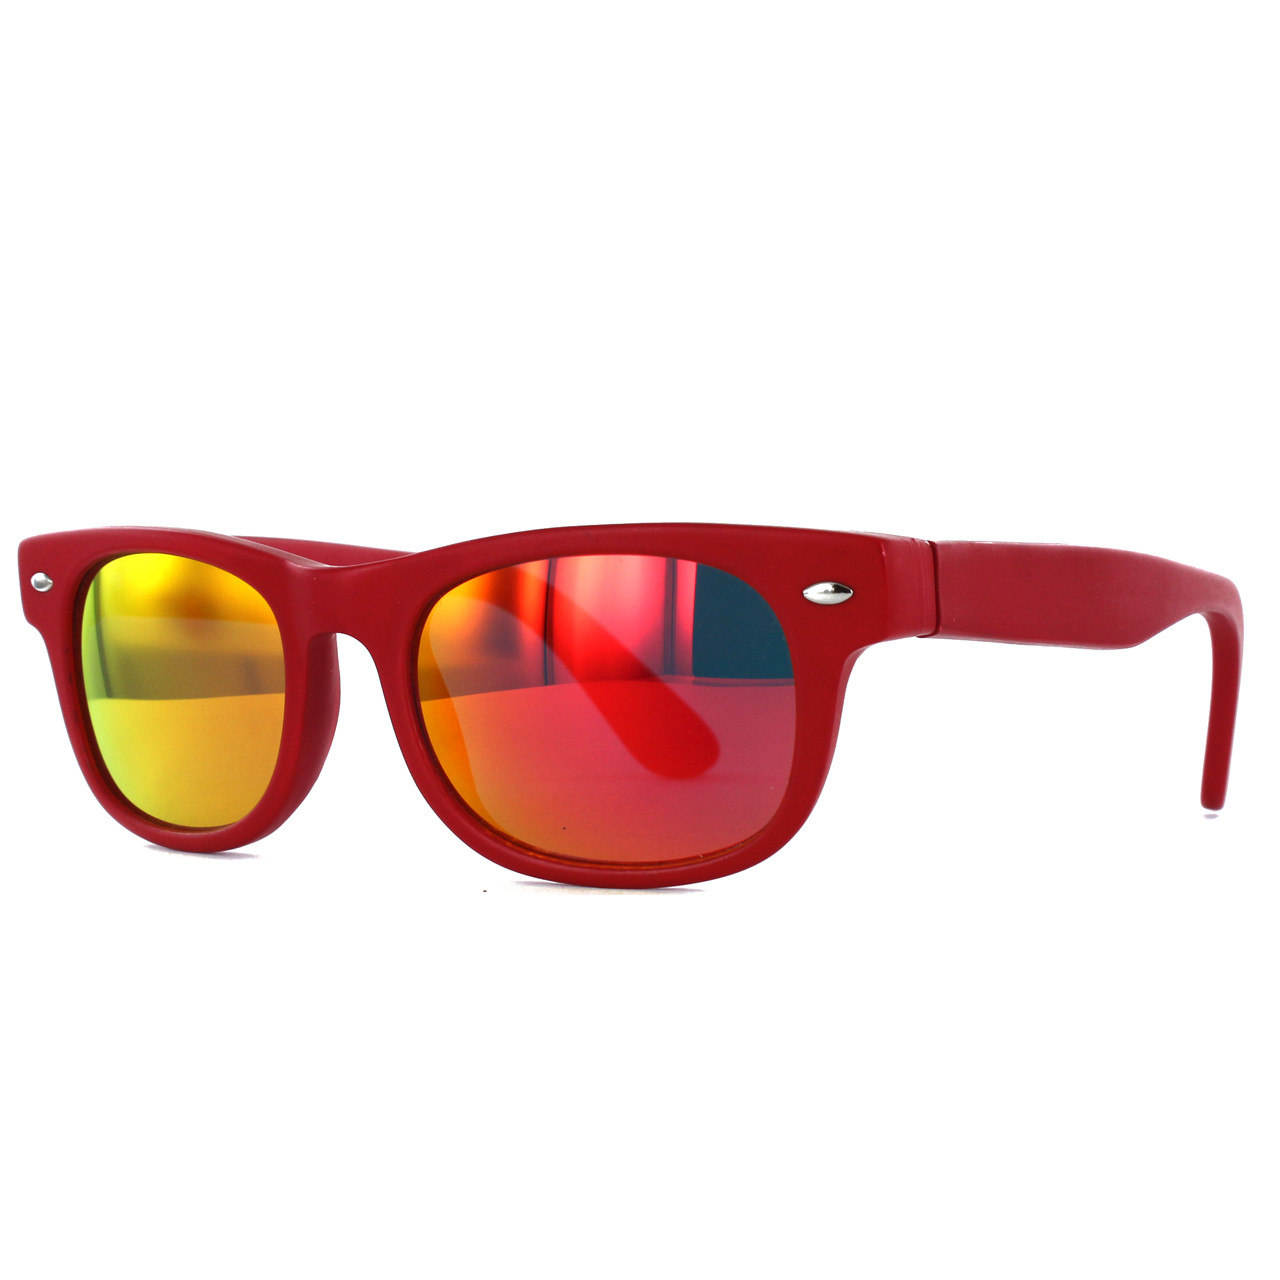 GEEK Eyewear GAMER Junior Sunglasses